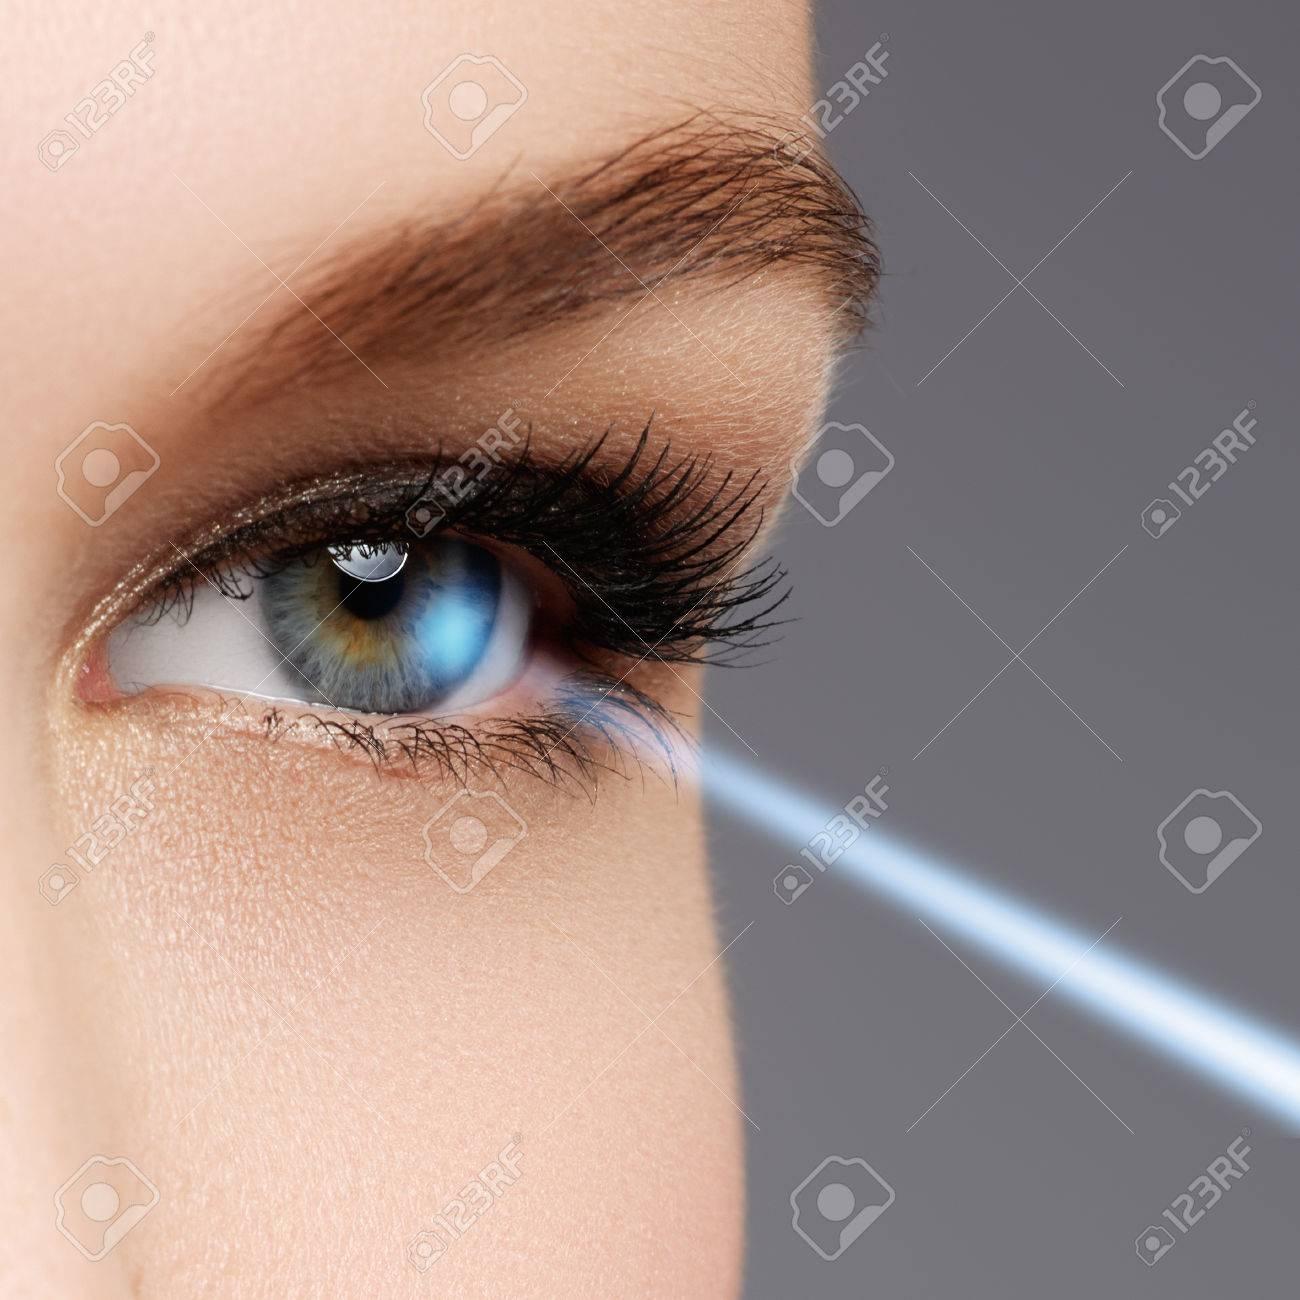 Laser vision correction. Woman's eye. Human eye. Woman eye with laser correction. Eyesight concept - 78135513